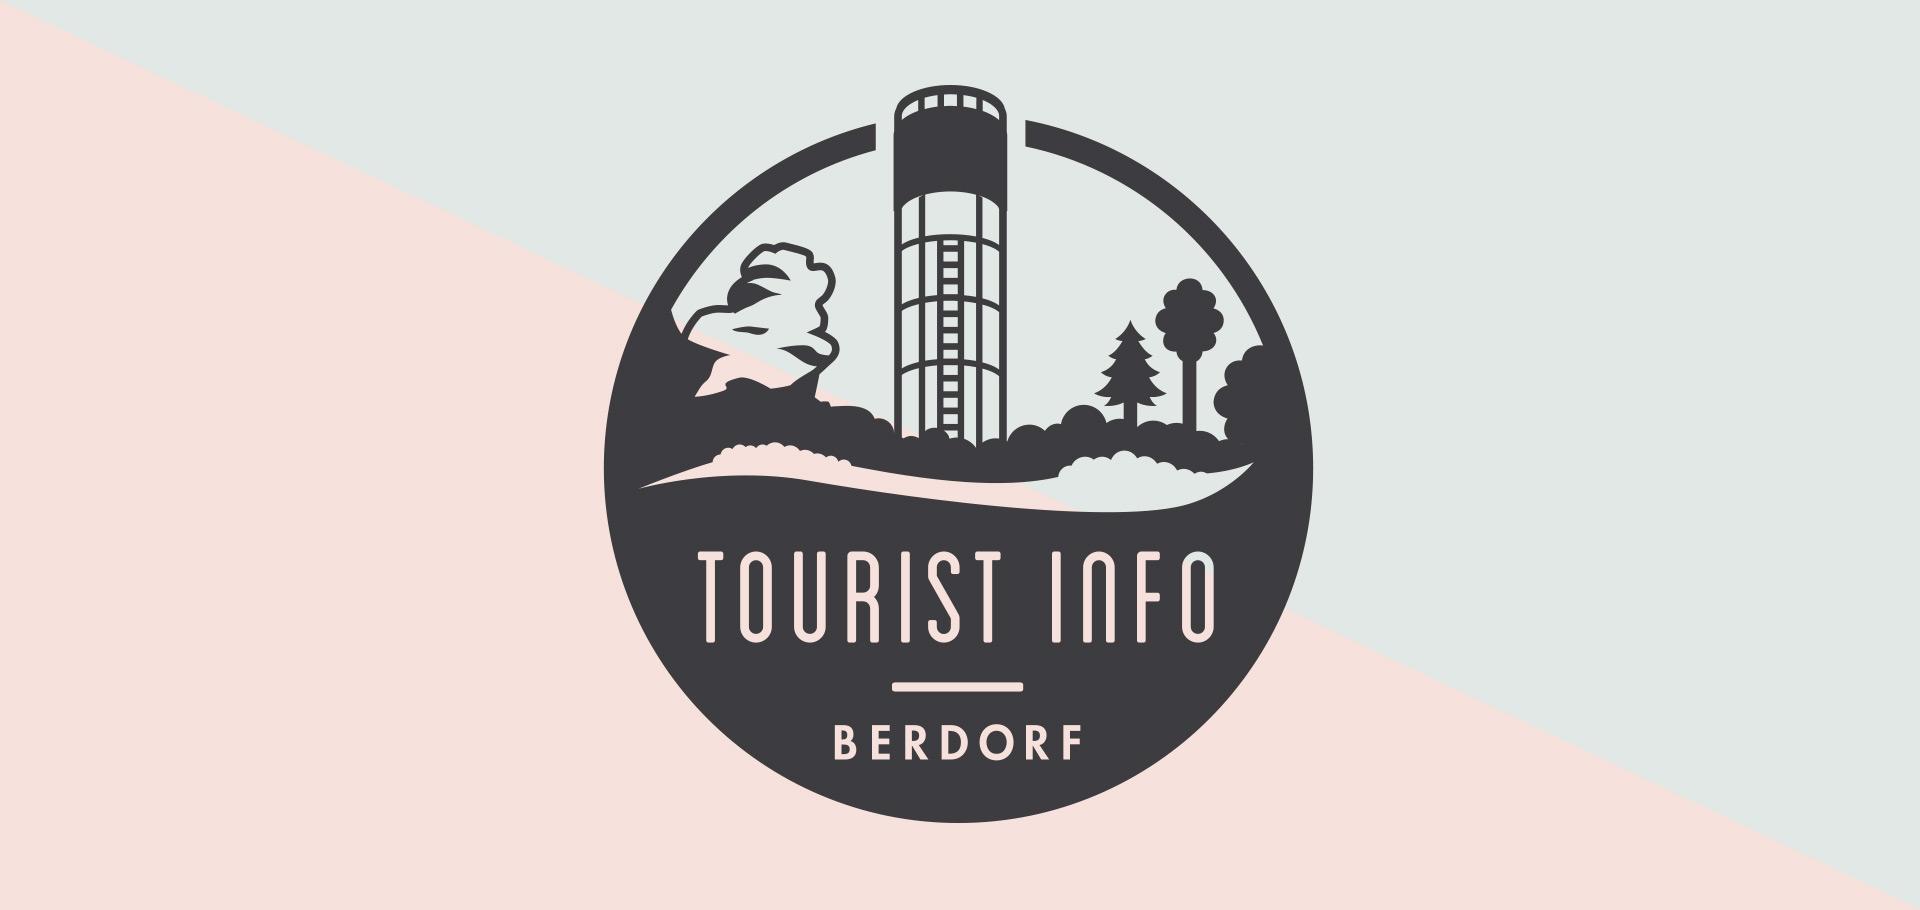 Camping_Martbusch_Berdorf_Luxemburg_Tourist_Info_01